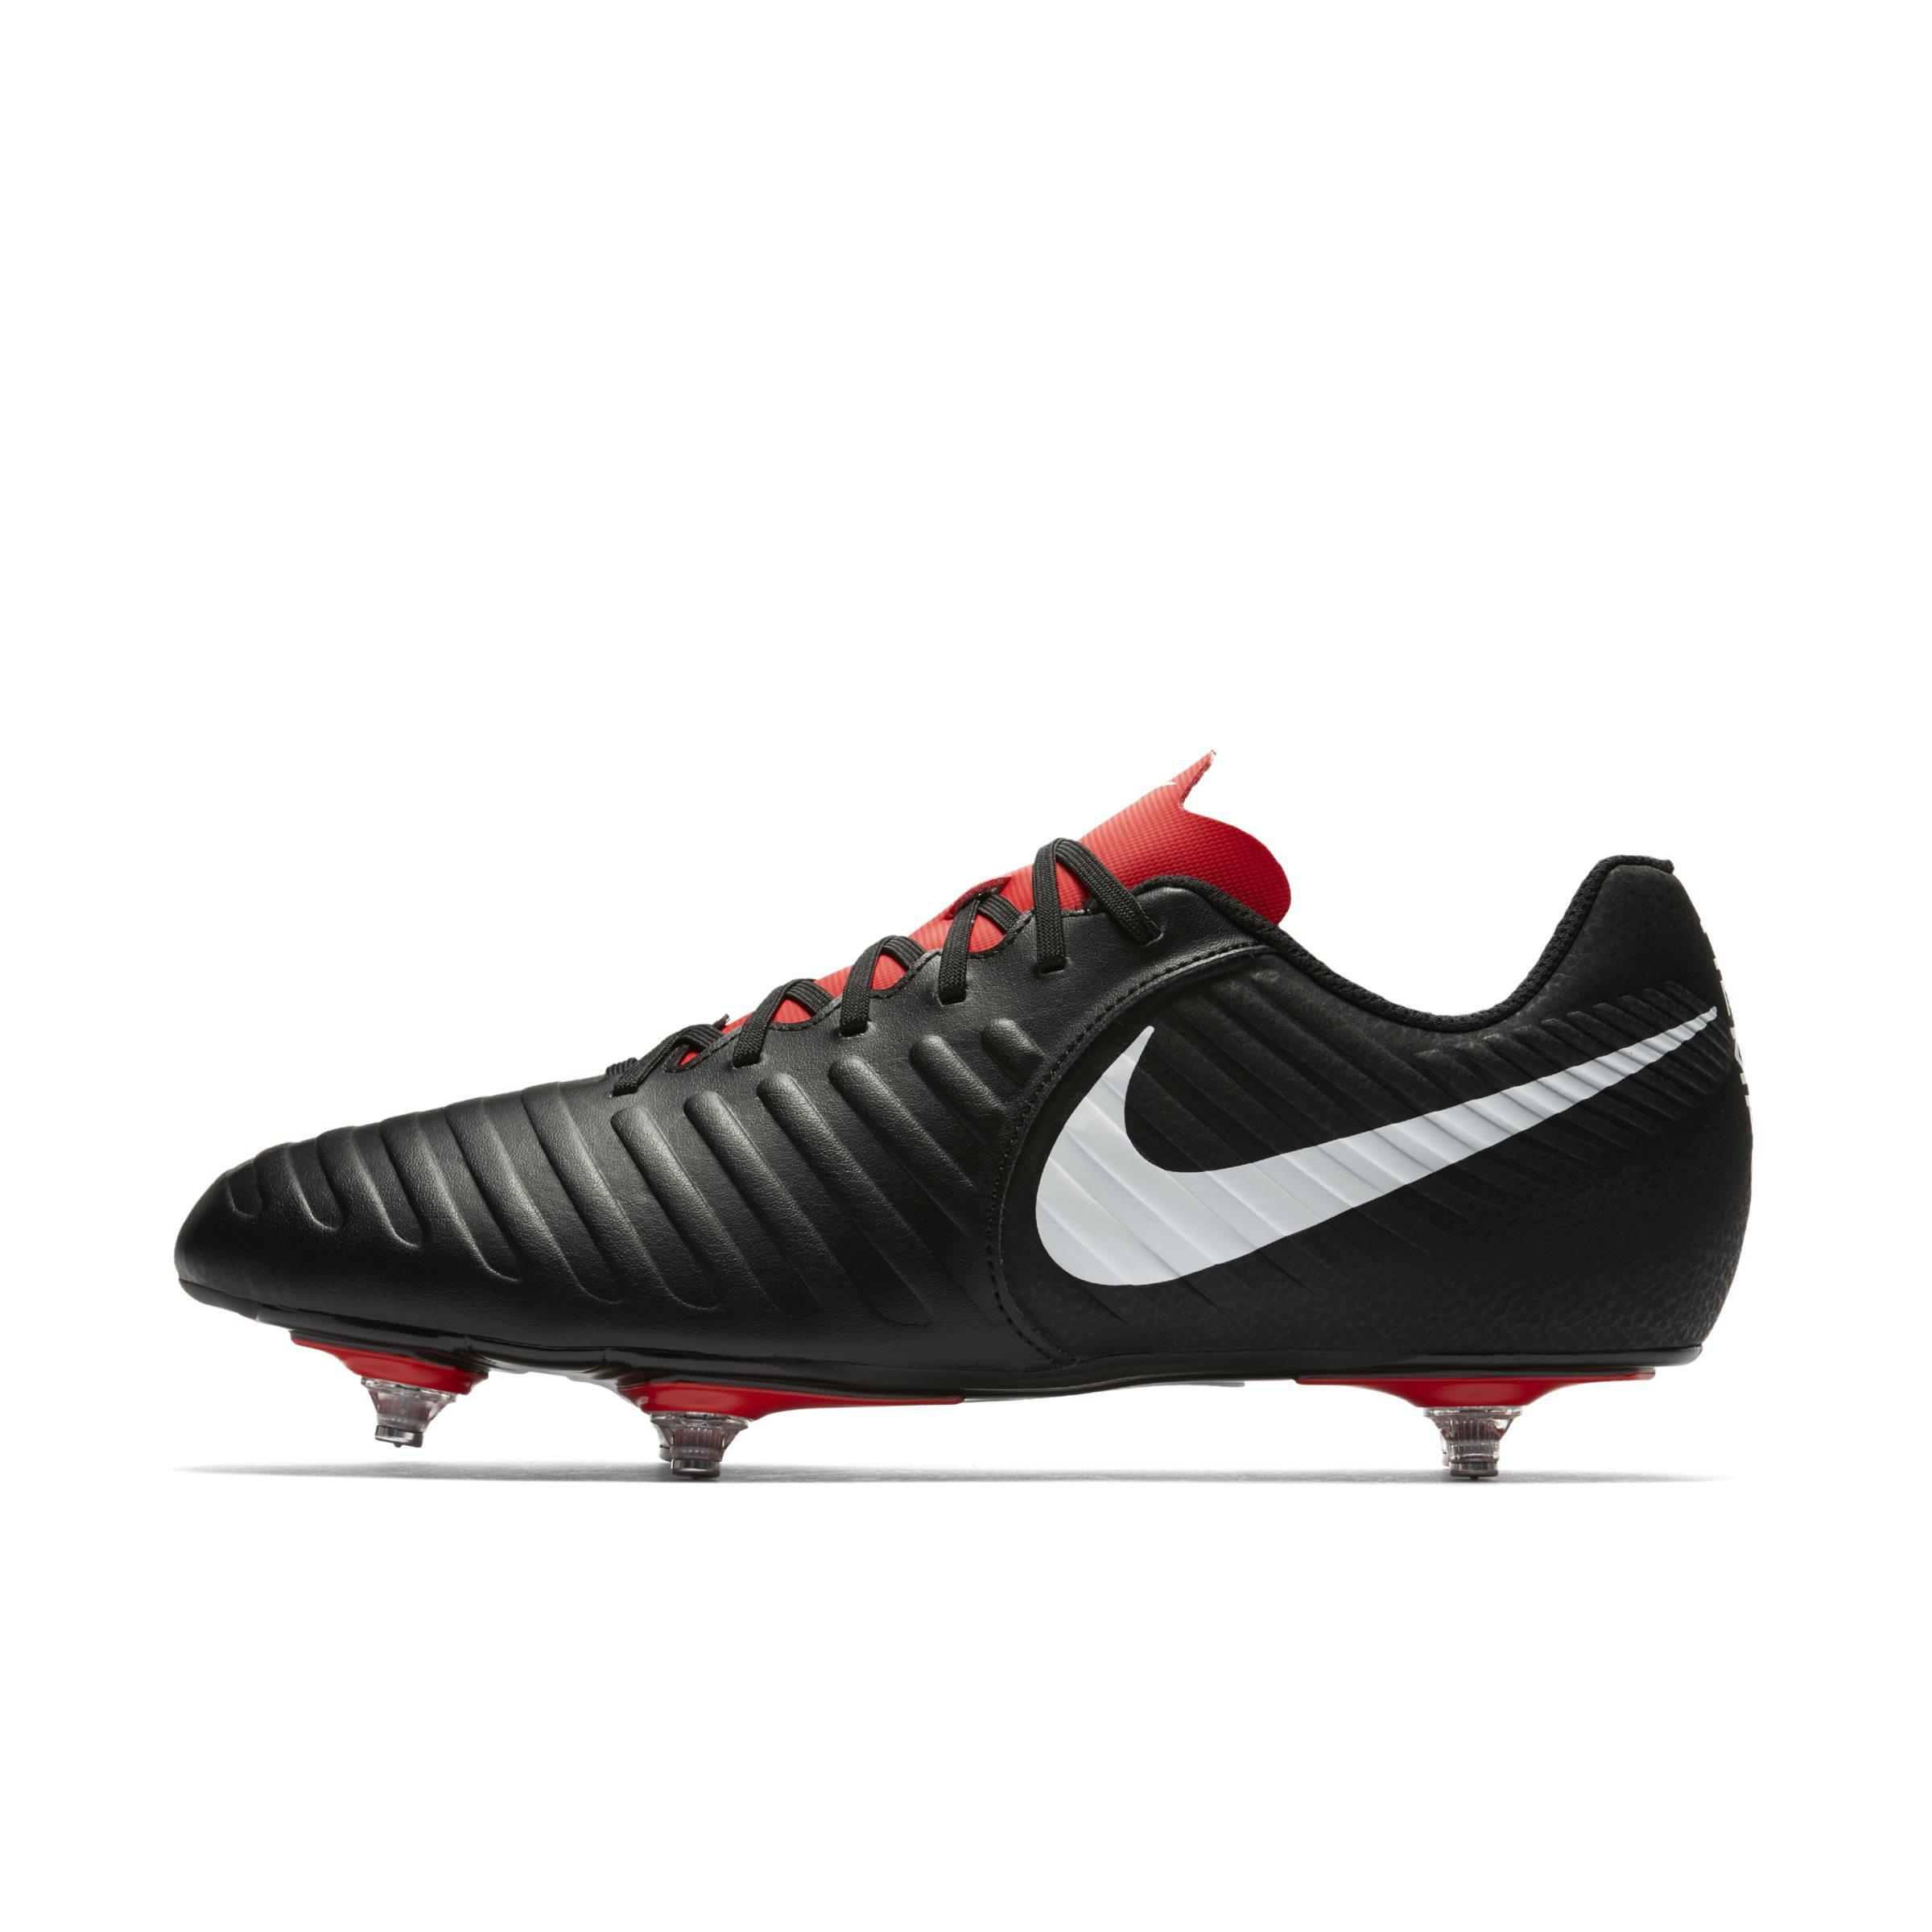 b0ea4f06916b Nike Tiempo Legend Vii Club Soft-ground Football Boot in Black - Lyst